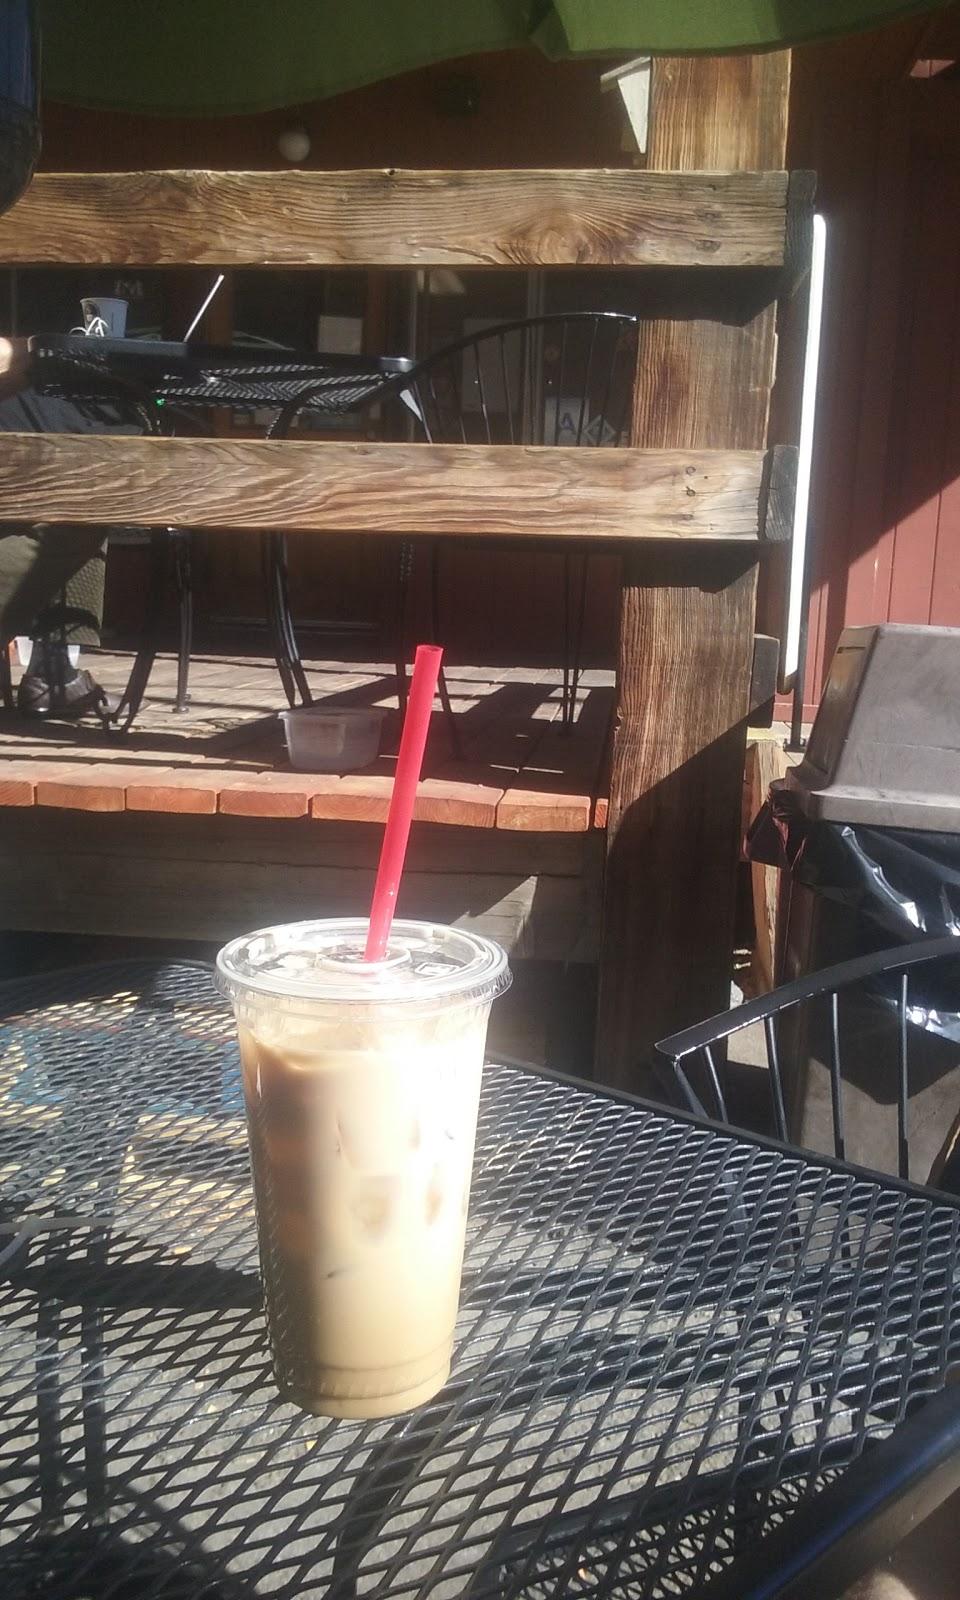 Village Grind - cafe    Photo 8 of 10   Address: 6020 Park Dr, Wrightwood, CA 92397, USA   Phone: (760) 249-5501